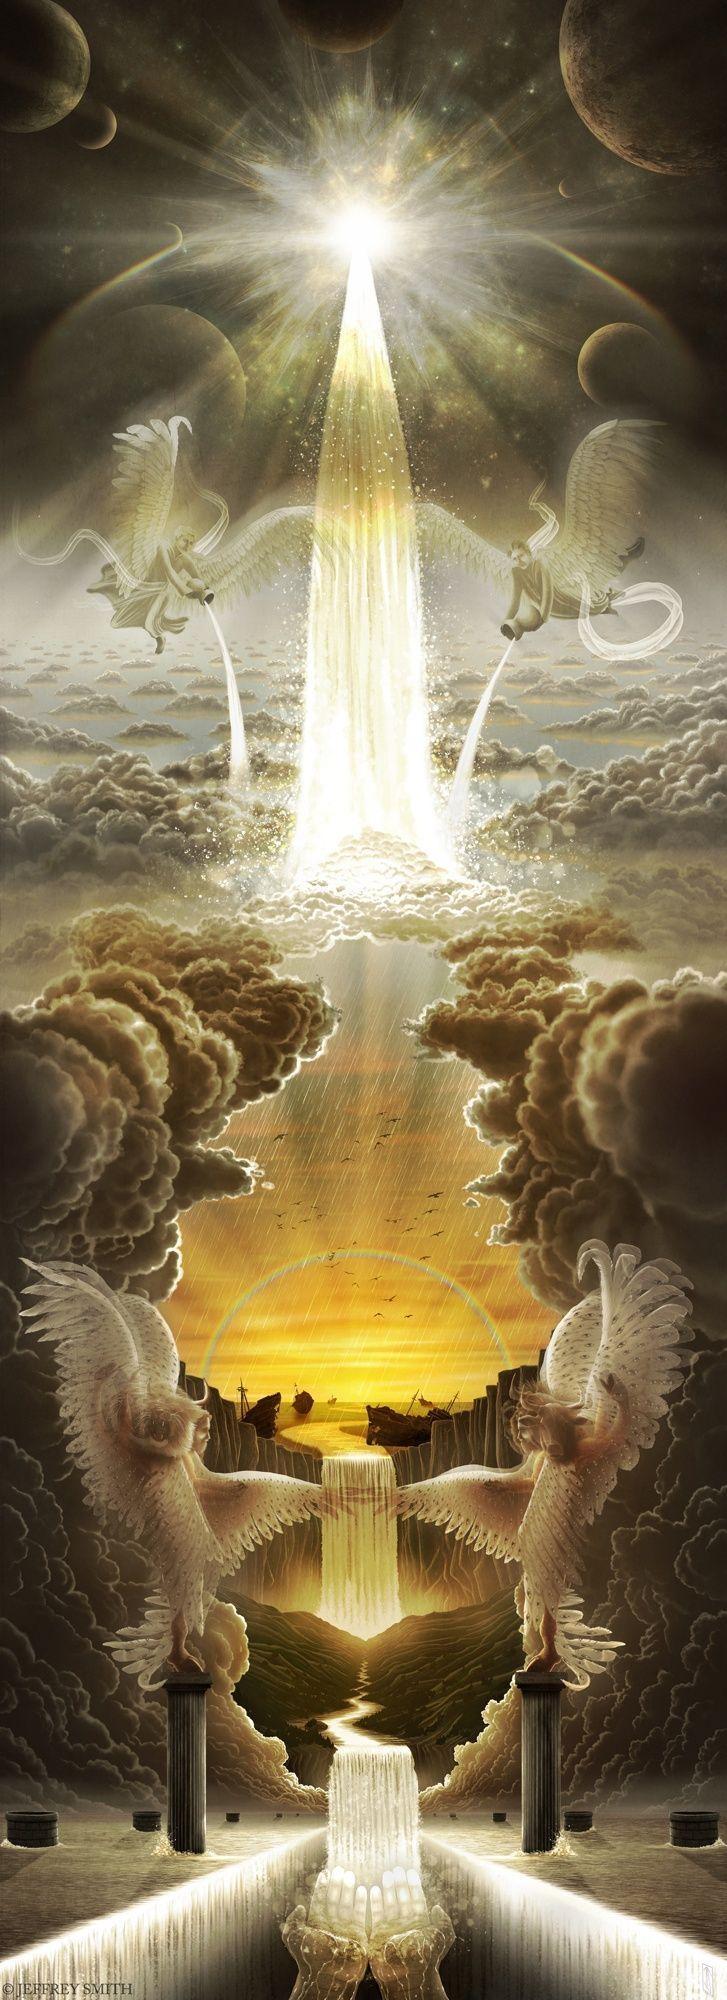 25+ Best Fruits Of Holy Spirit Ideas On Pinterest | Fruit Spirit Inside Fruit Of The Spirit Artwork (Image 4 of 20)